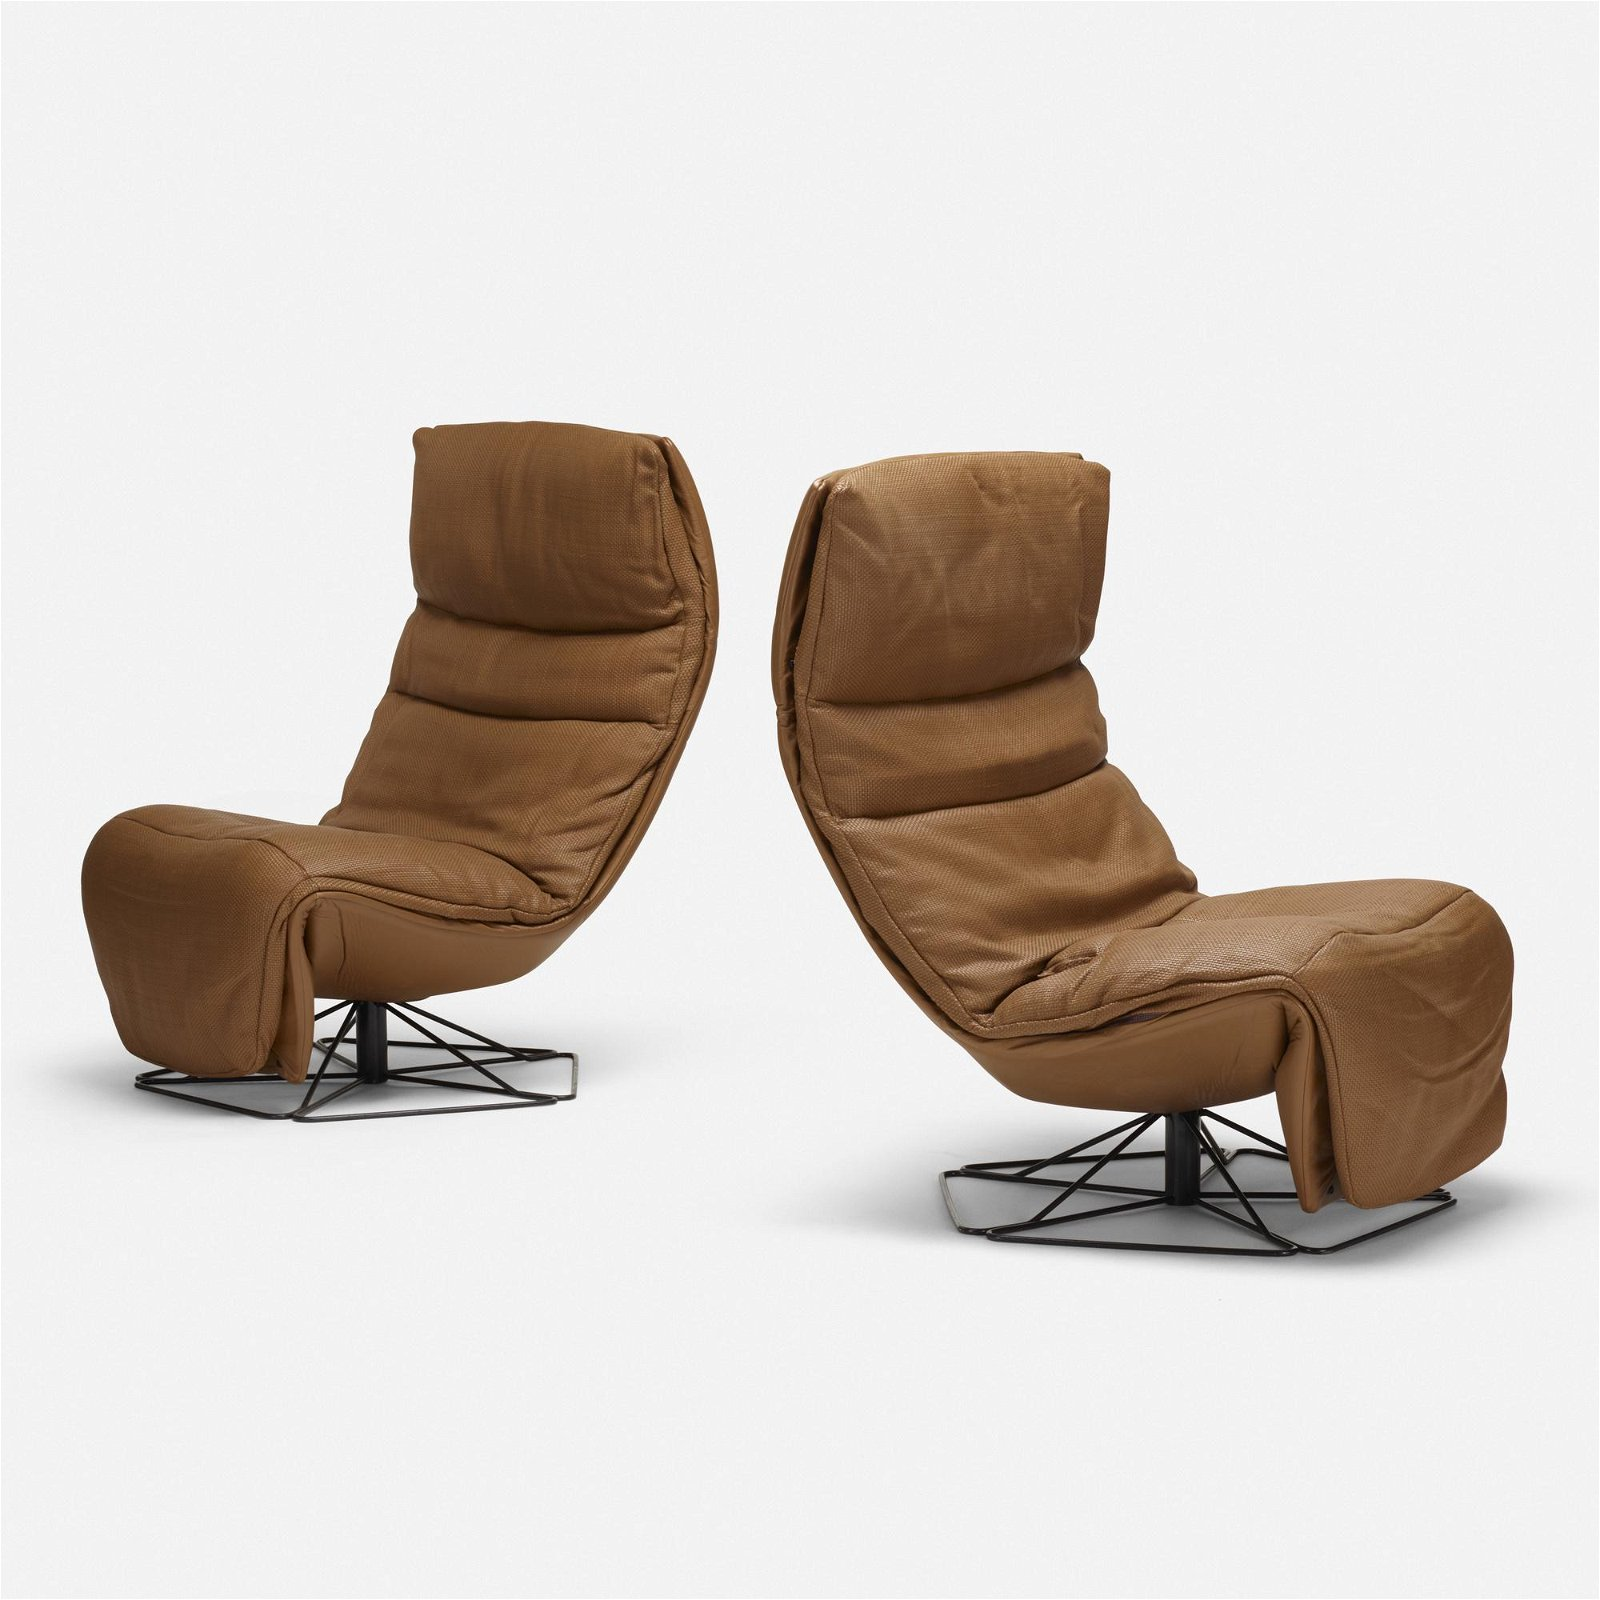 American, reclining swivel chairs, pair